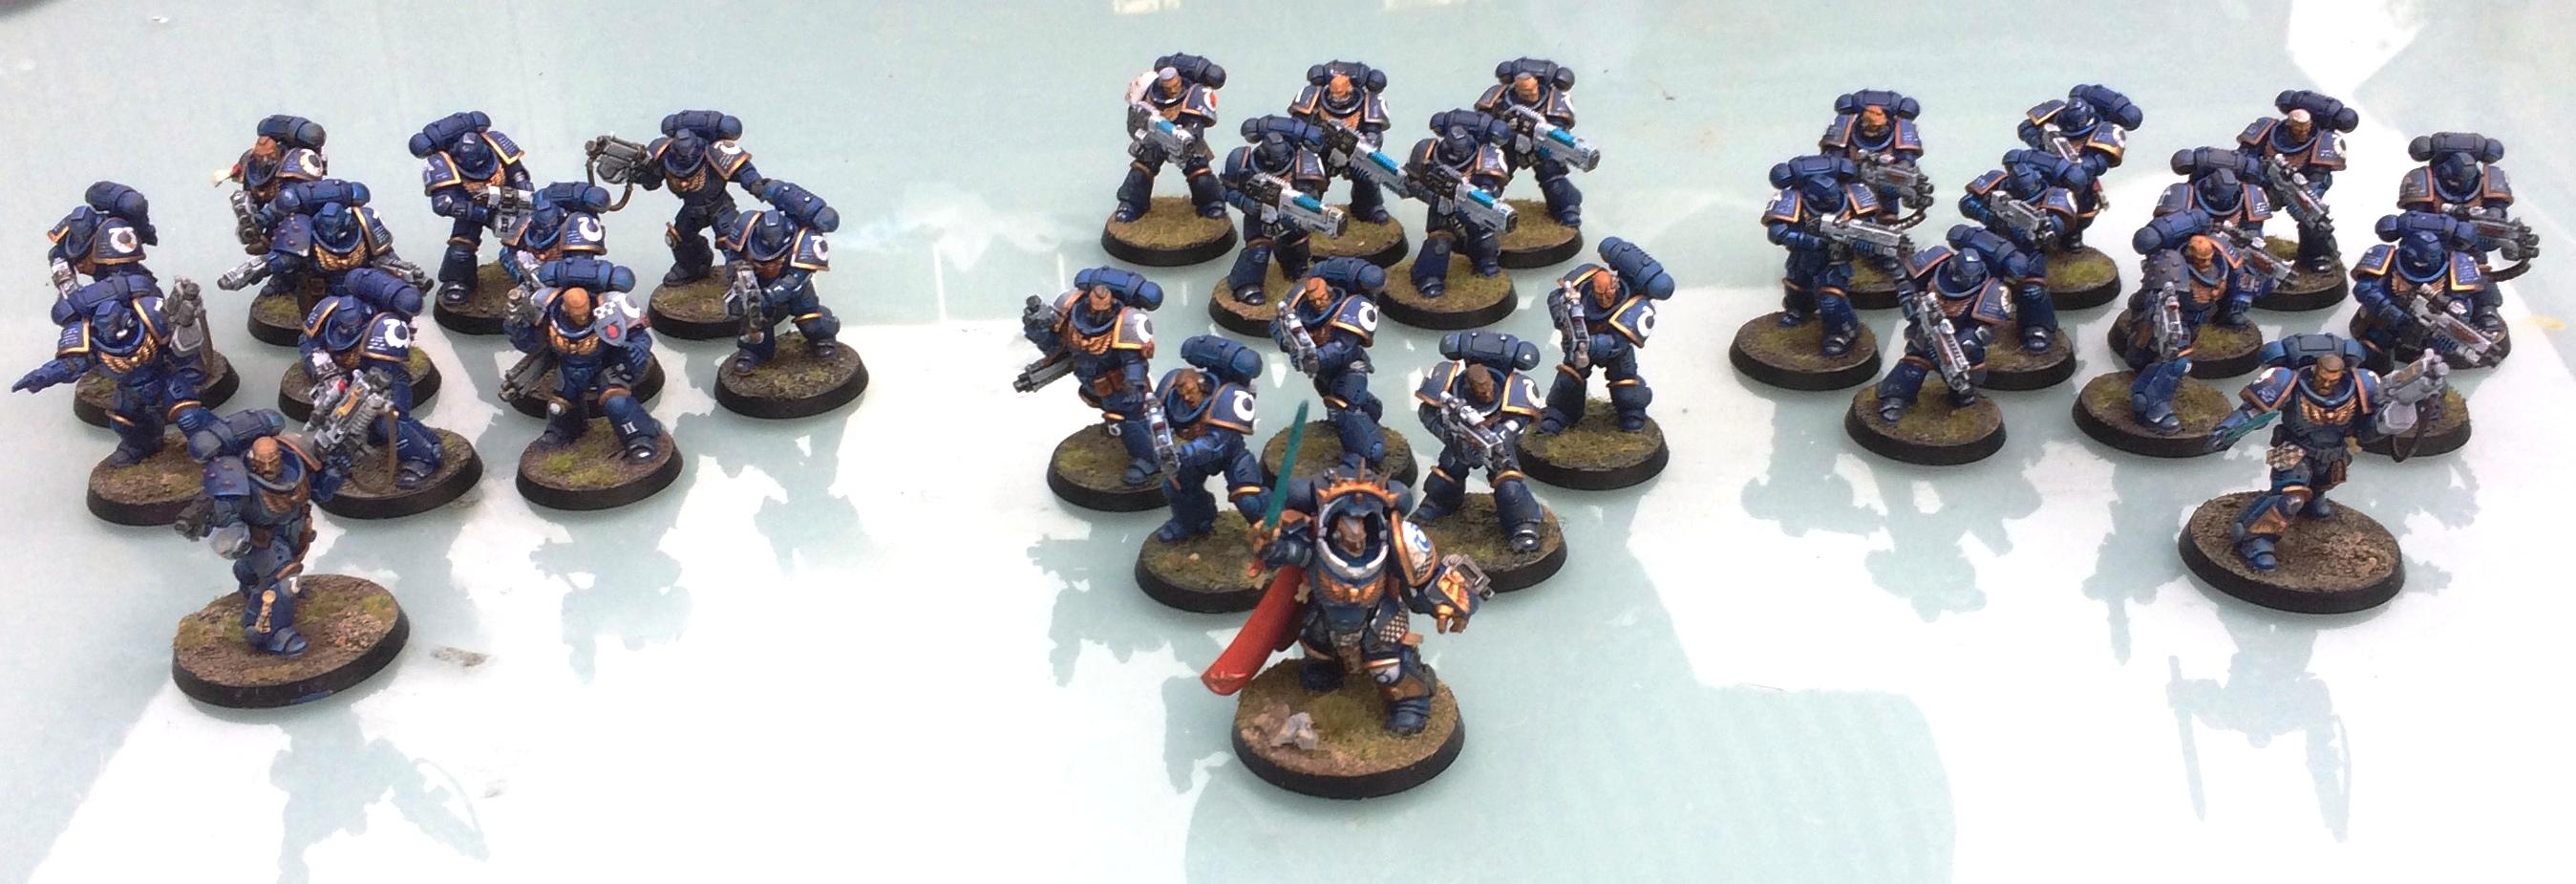 Ultramarines Primaris infantry